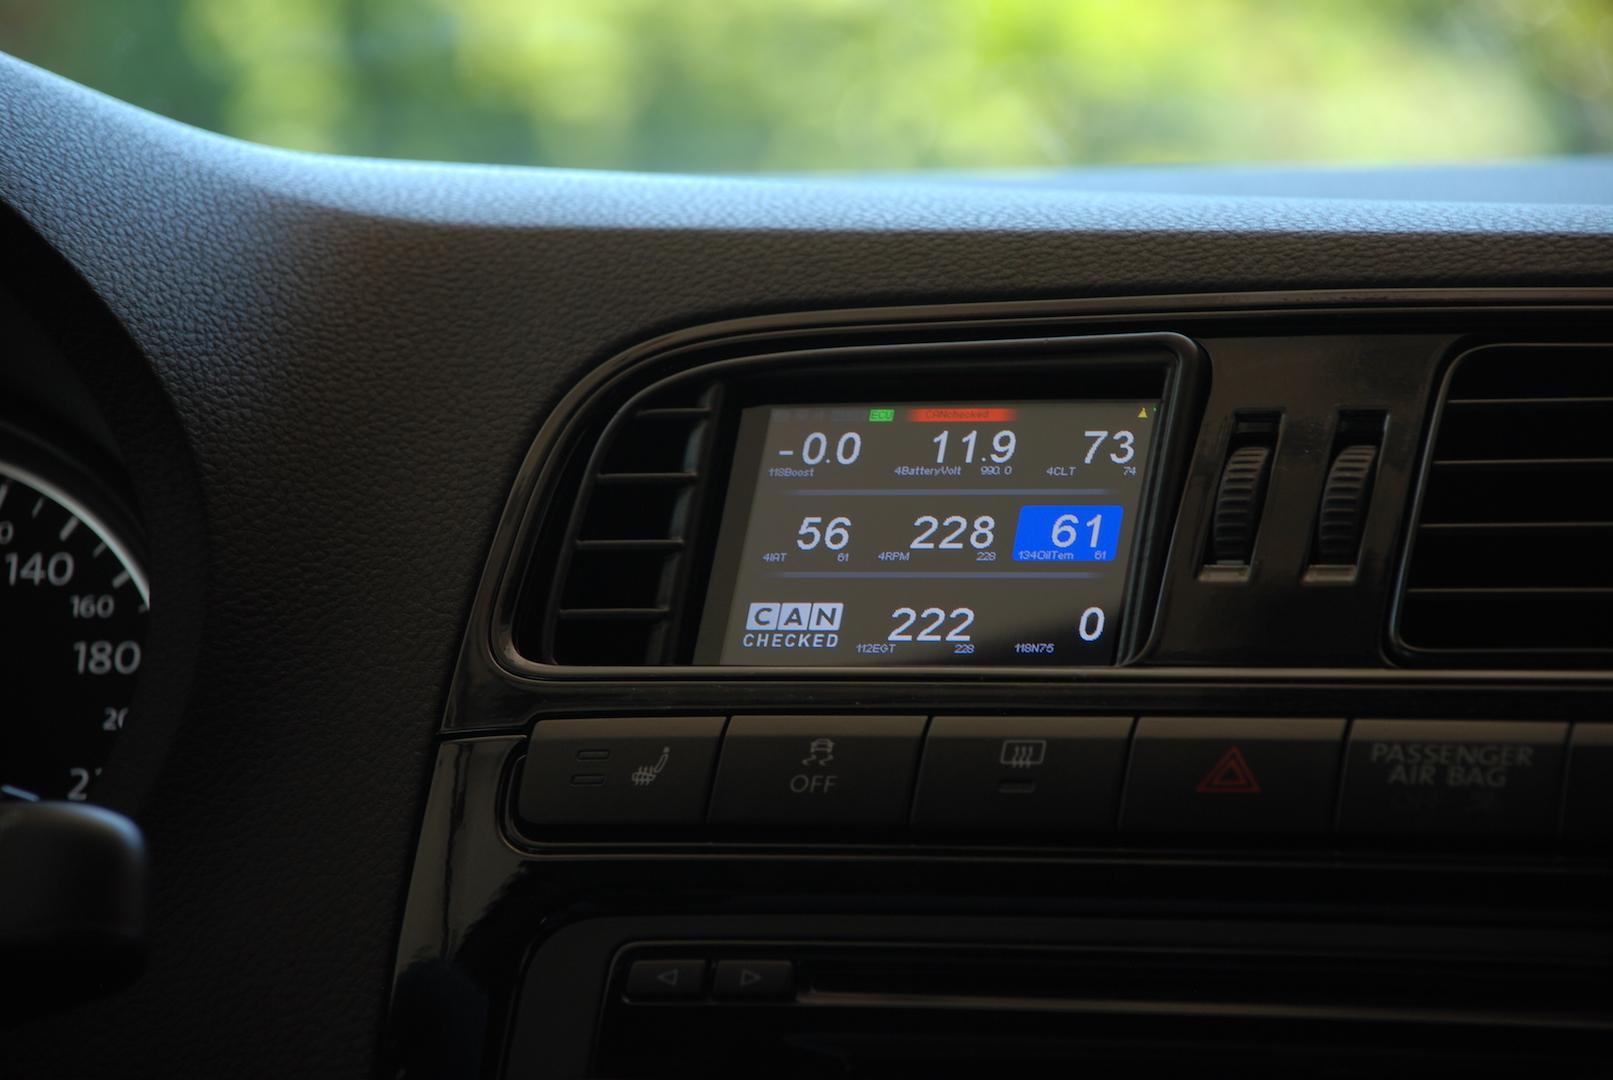 Golf MK7 GTI R TCR display